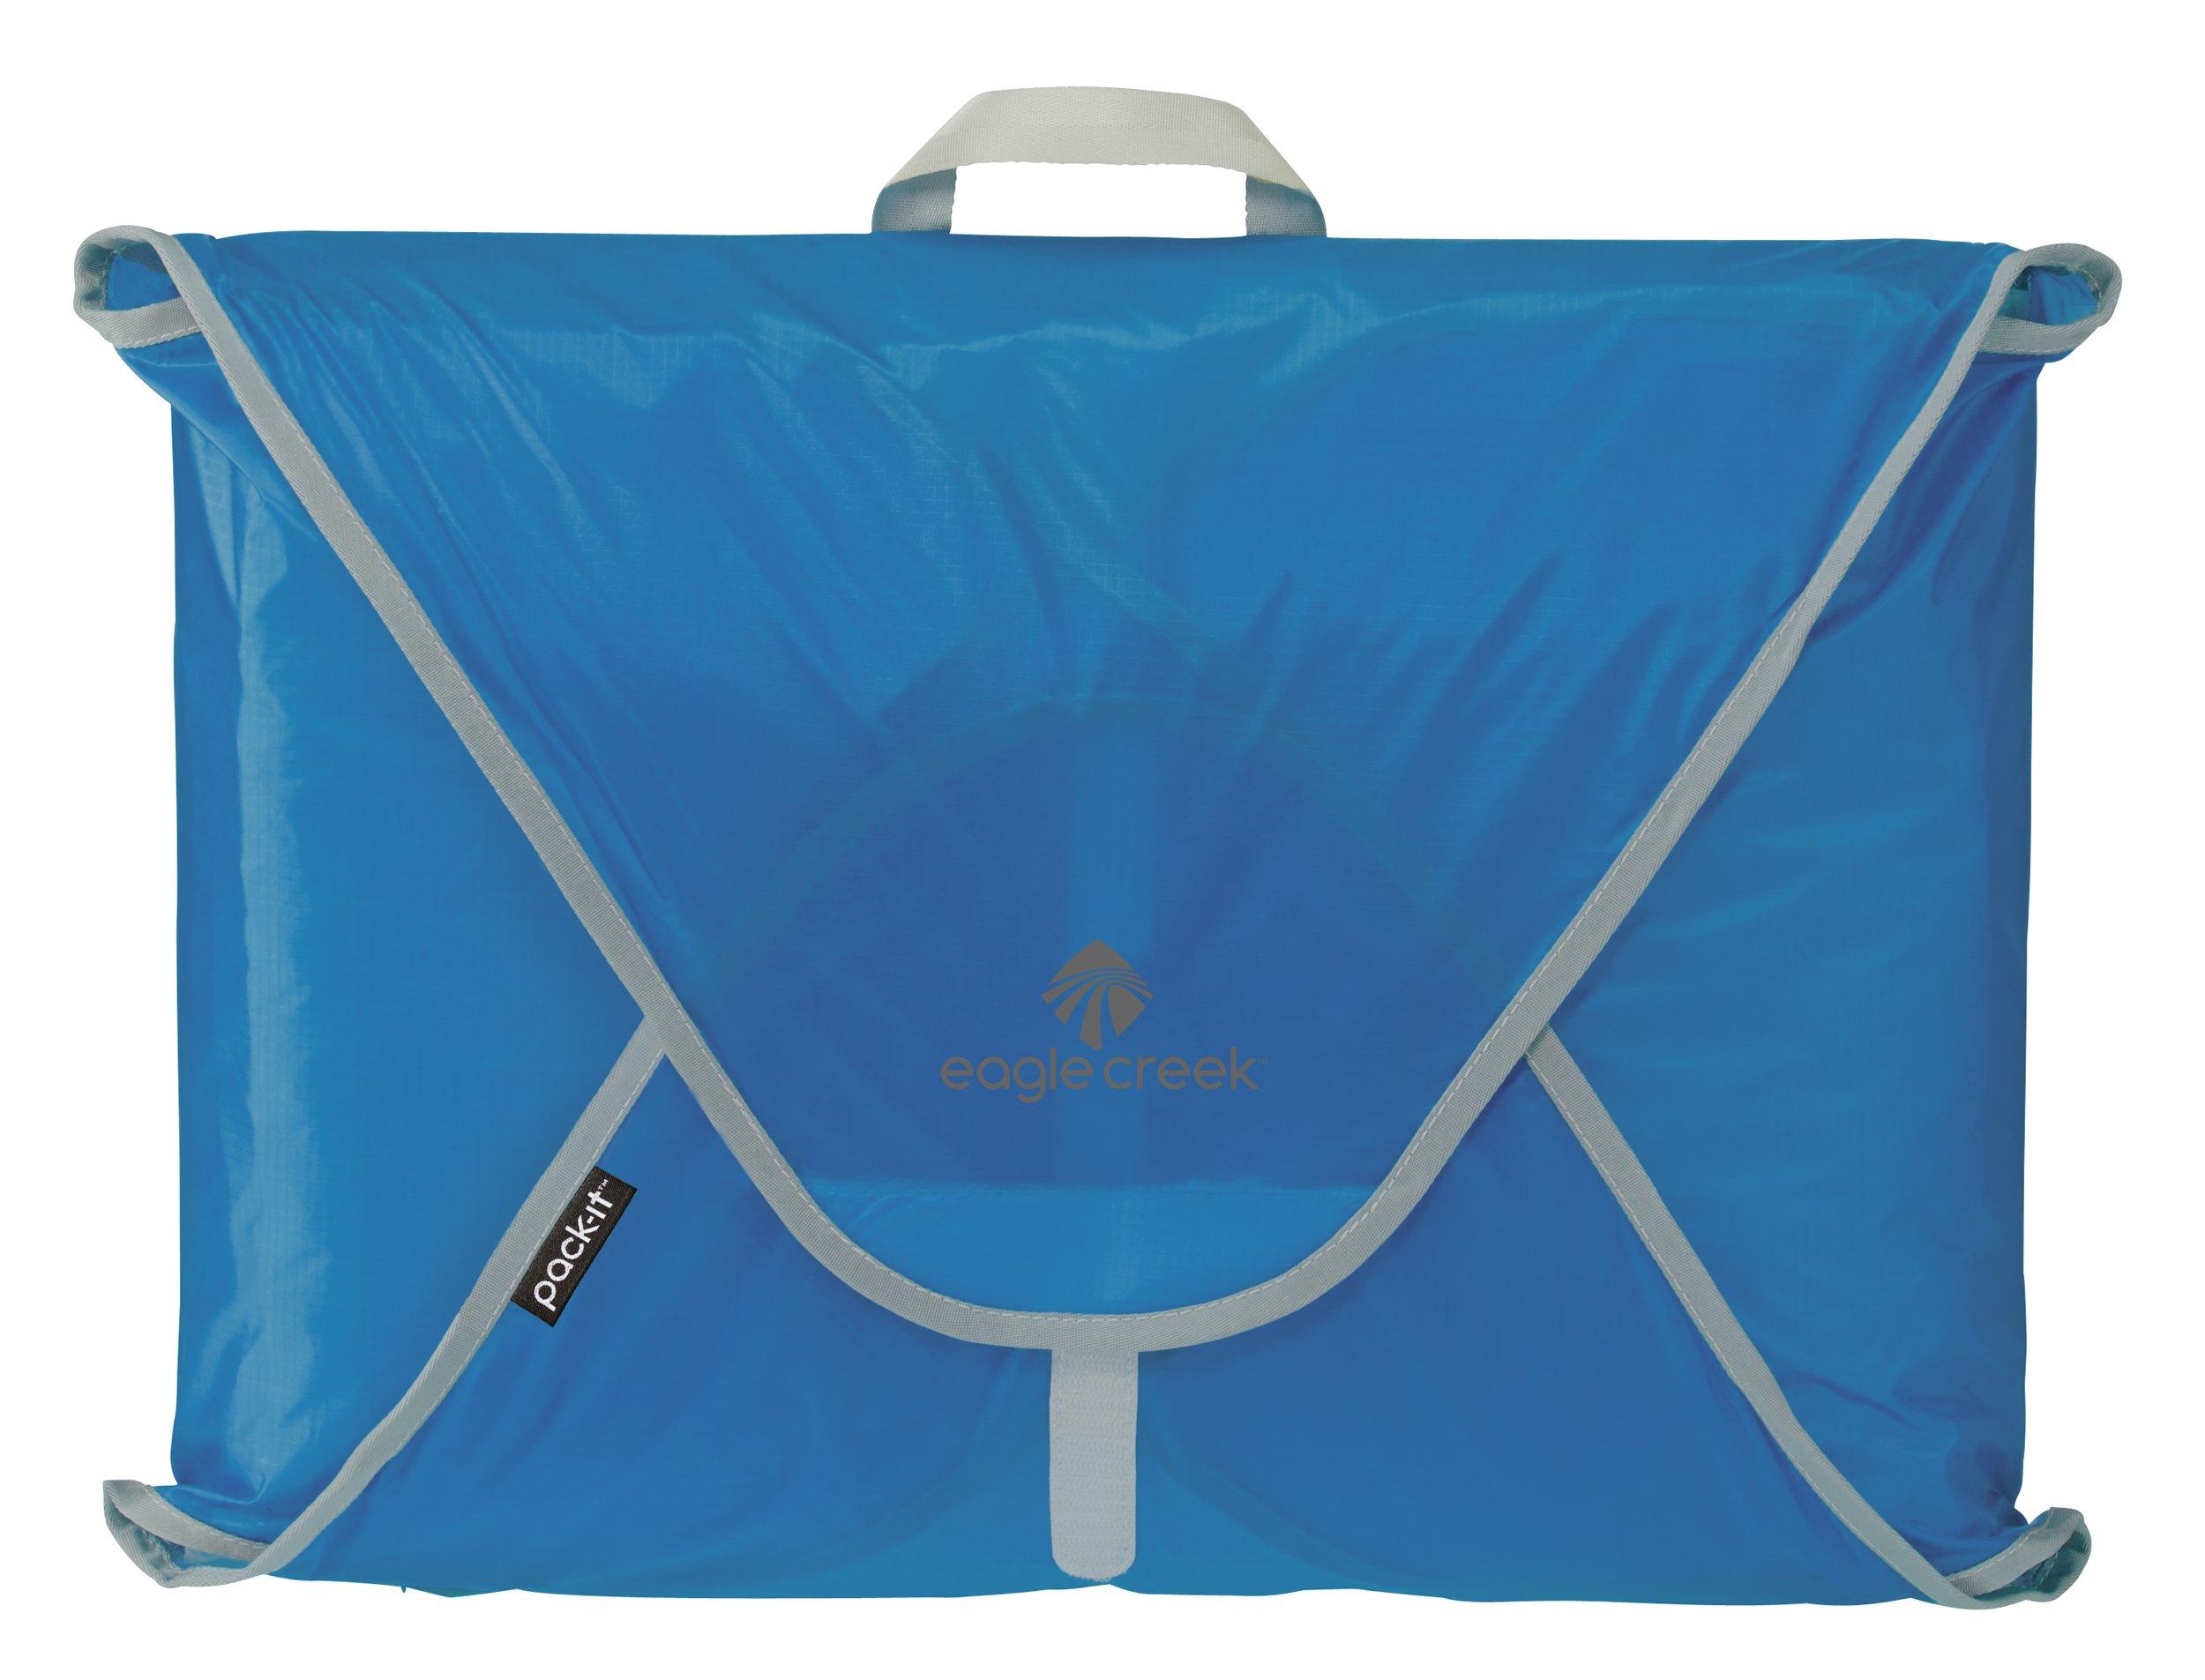 Eagle Creek Pack-It Specter Garment Folder Packing Organizer, Brilliant Blue (L) by Eagle Creek